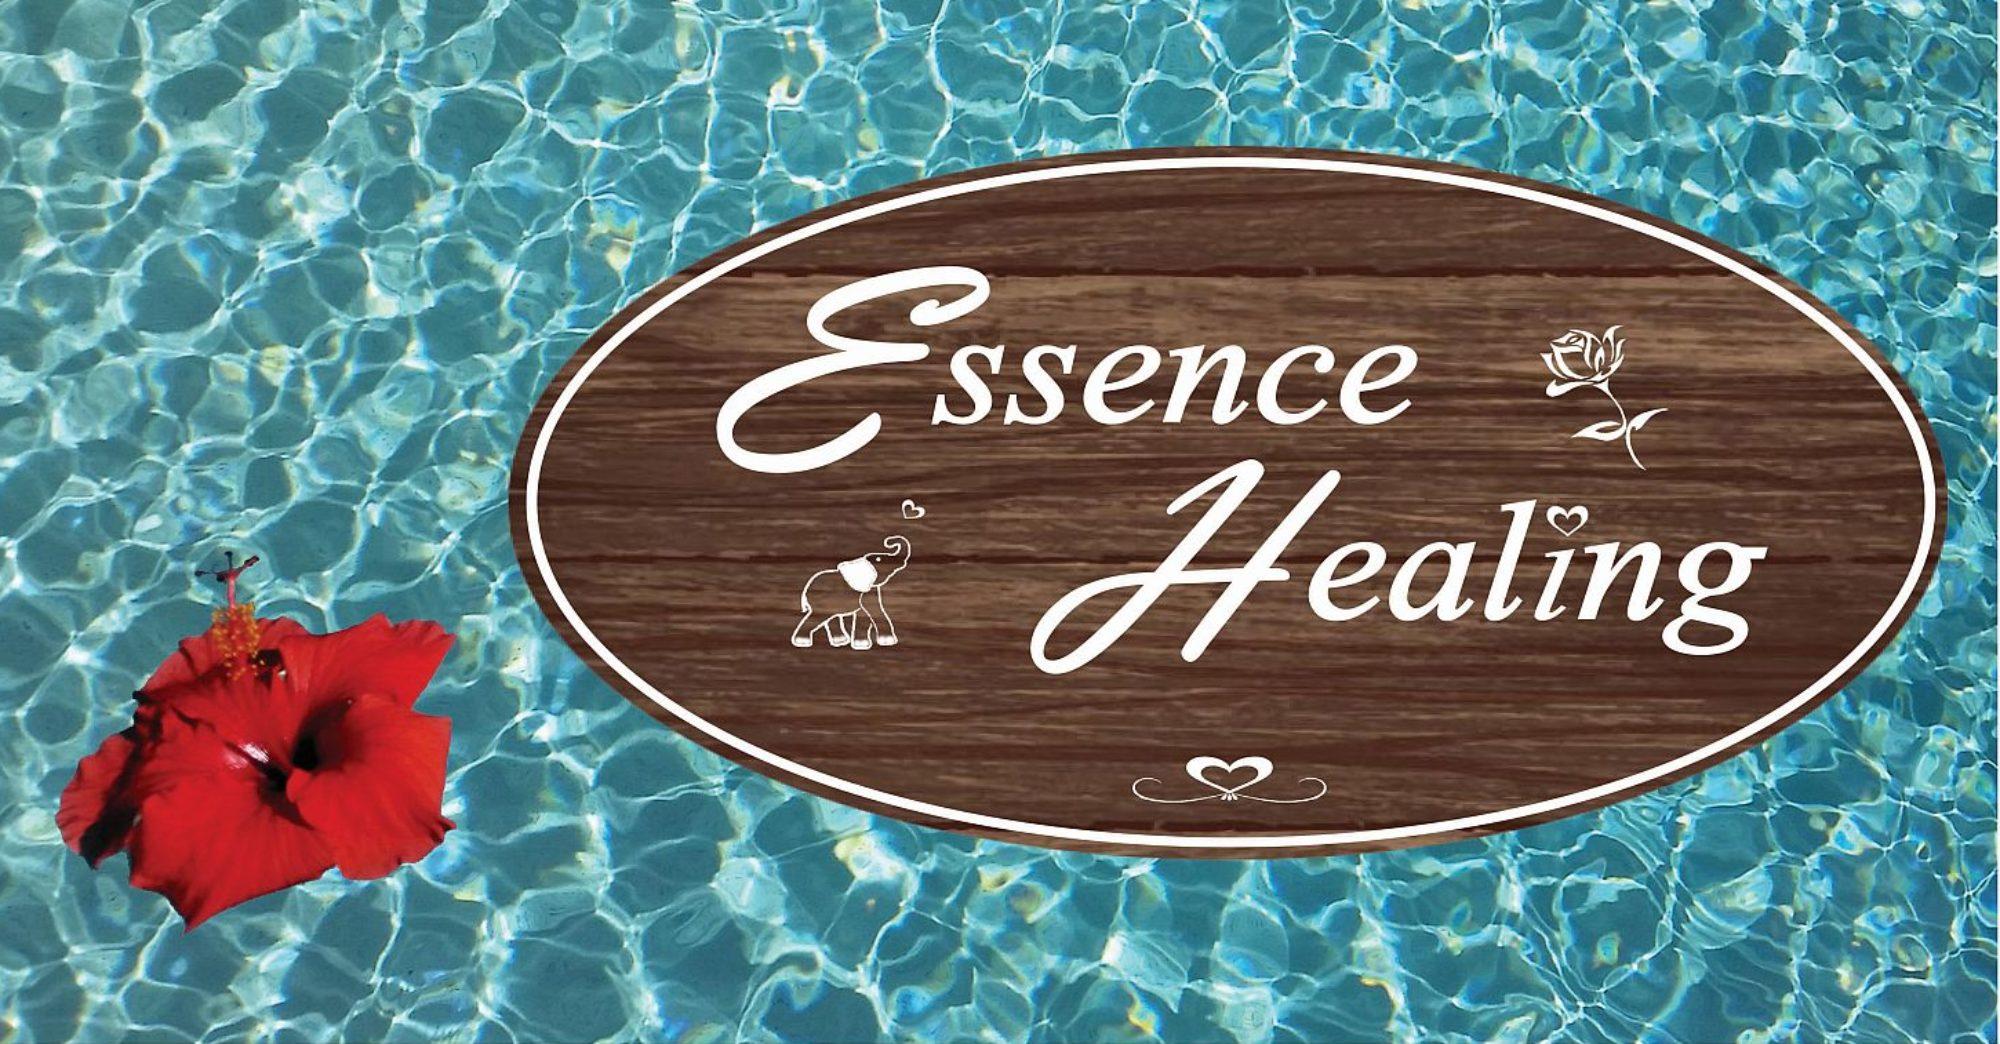 Essence Healing